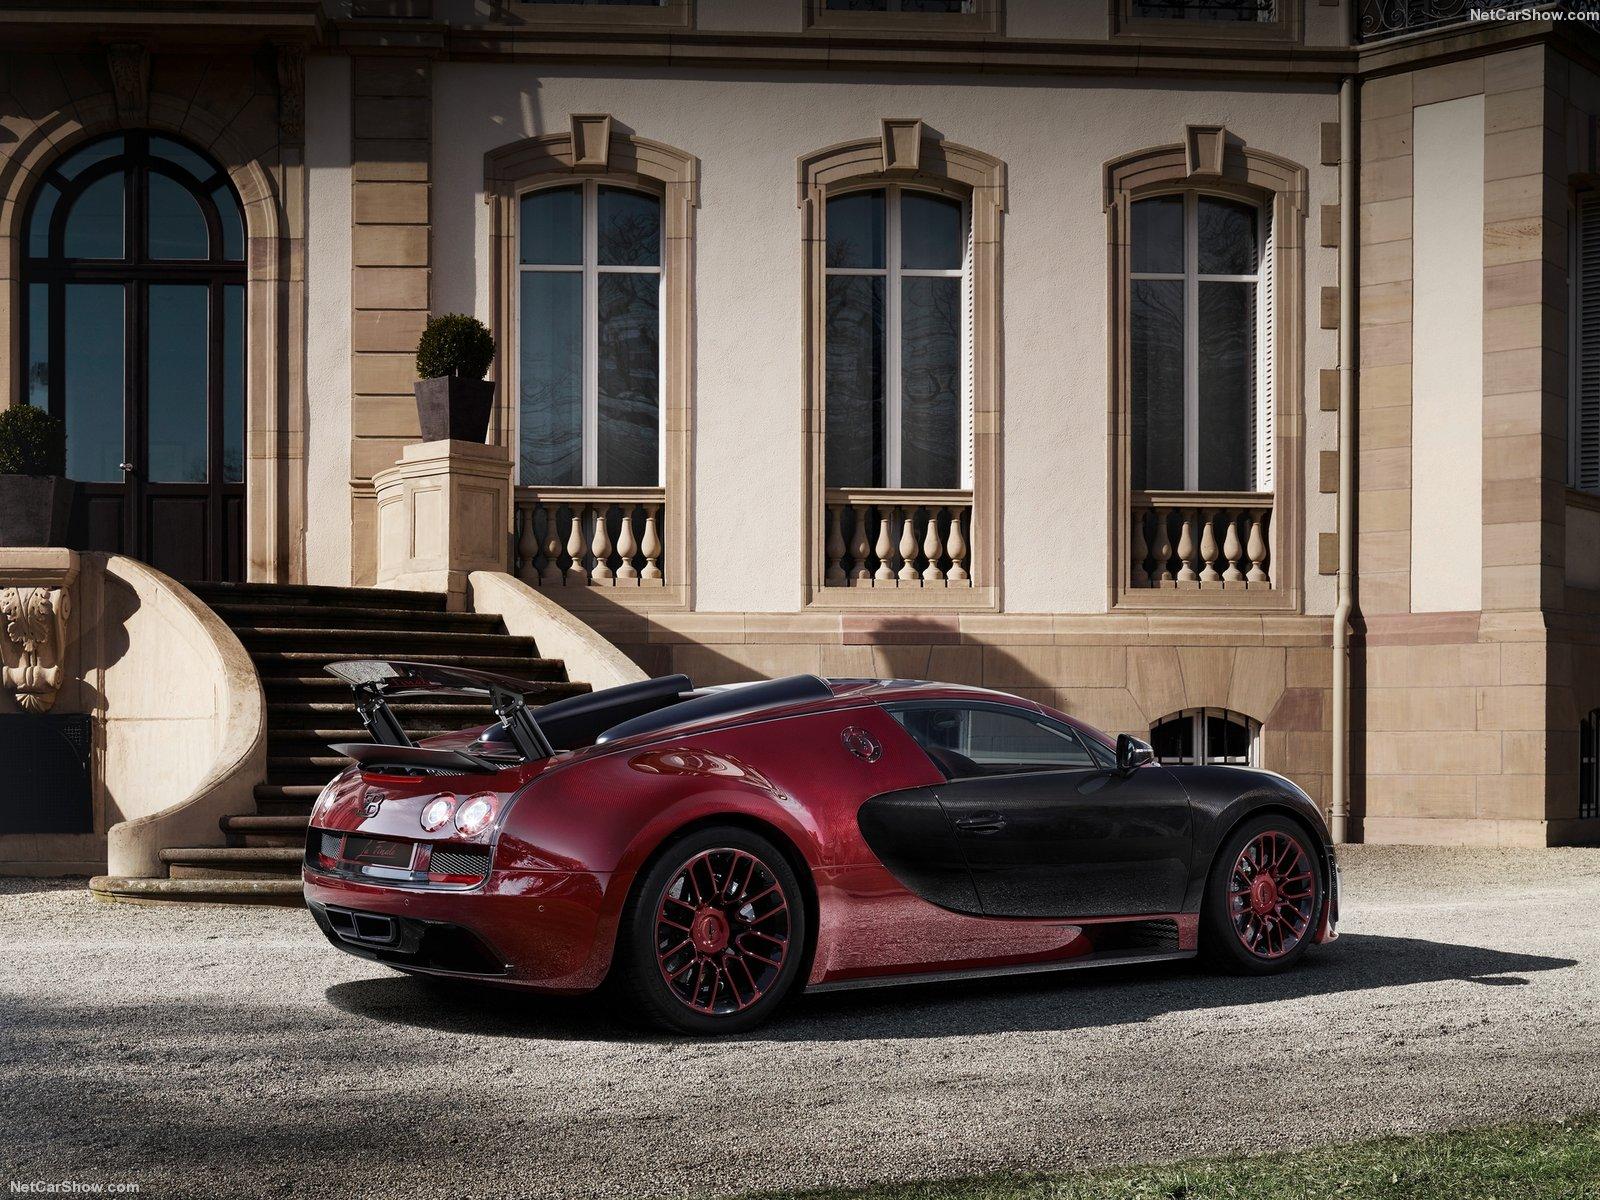 2015%2BBugatti%2BVeyron%2BGrand%2BSport%2BVitesse%2BLa%2BFinale%2B%25284%2529 Astounding Xe Bugatti Veyron Grand Sport Vitesse Cars Trend